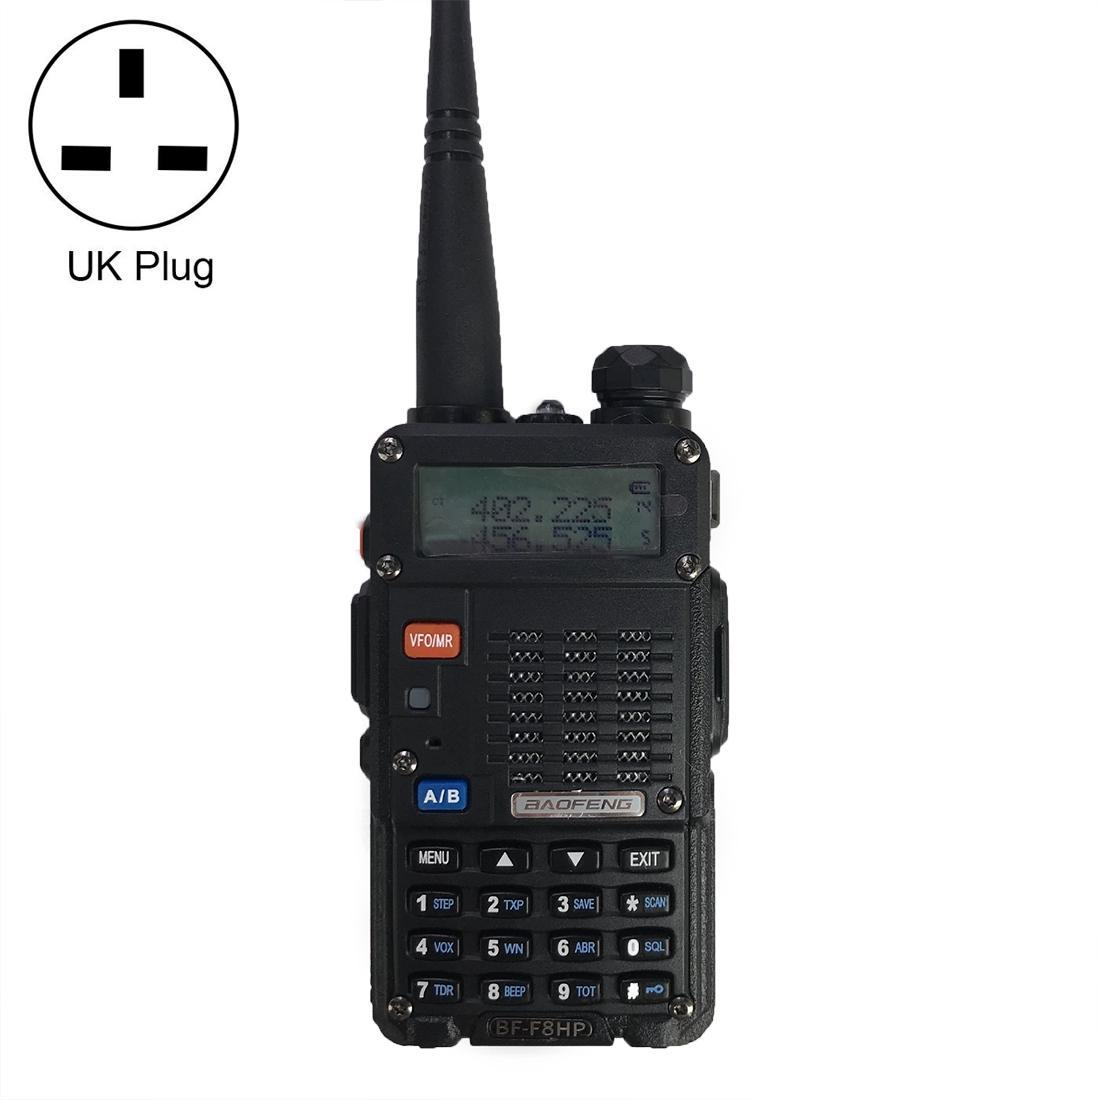 BaoFeng BF-F8HP 8W Dual Band Two-Way Radio VHF UHF Handheld Walkie Talkie, UK Plug